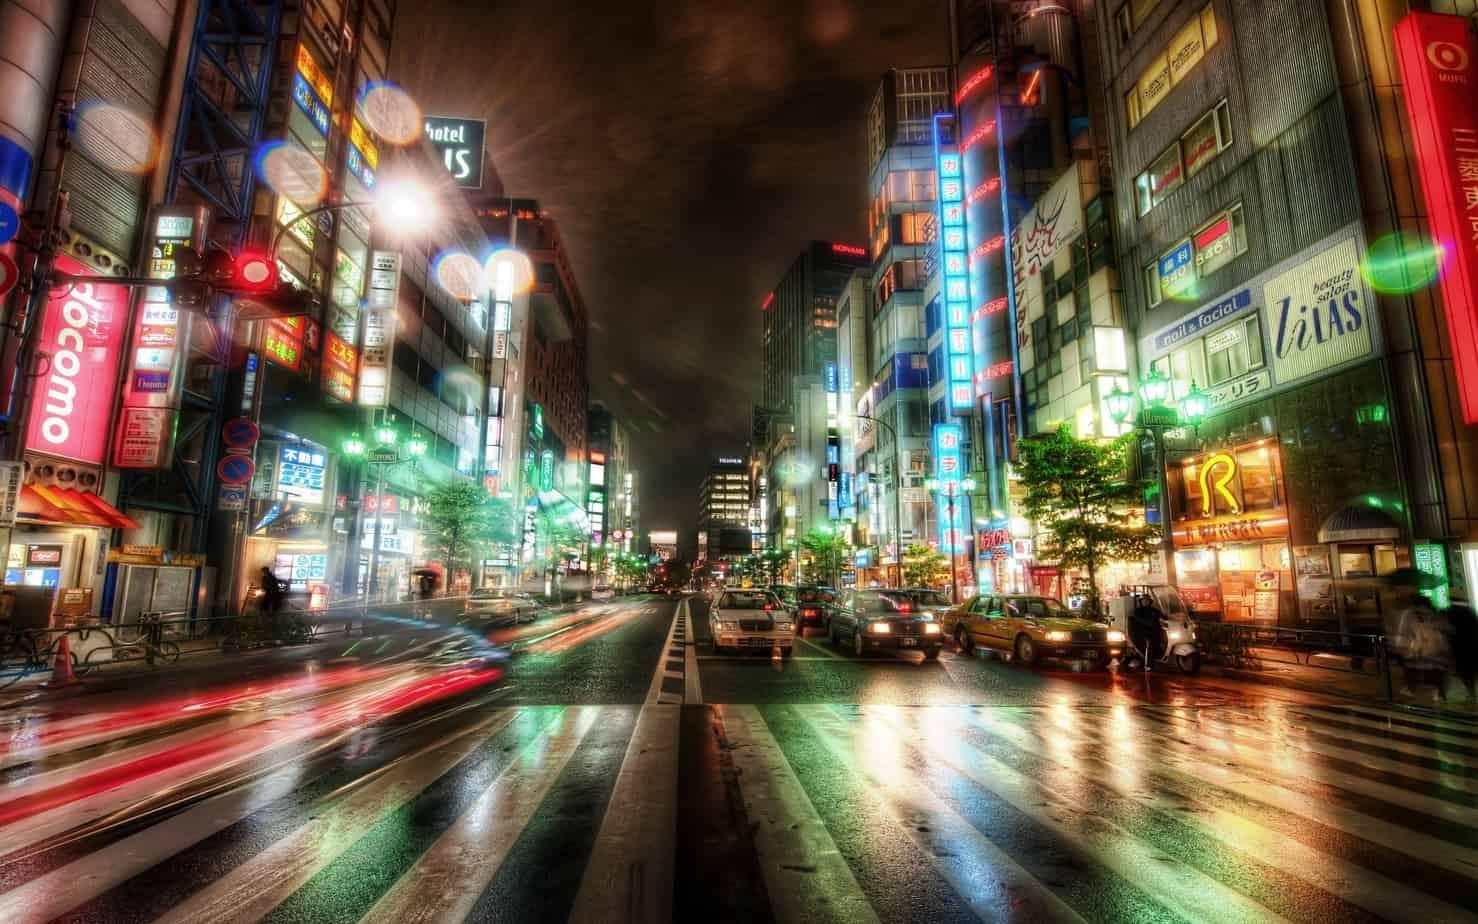 city night city Tokyo HDR 745031 wallhere.com  - city-night-city-Tokyo